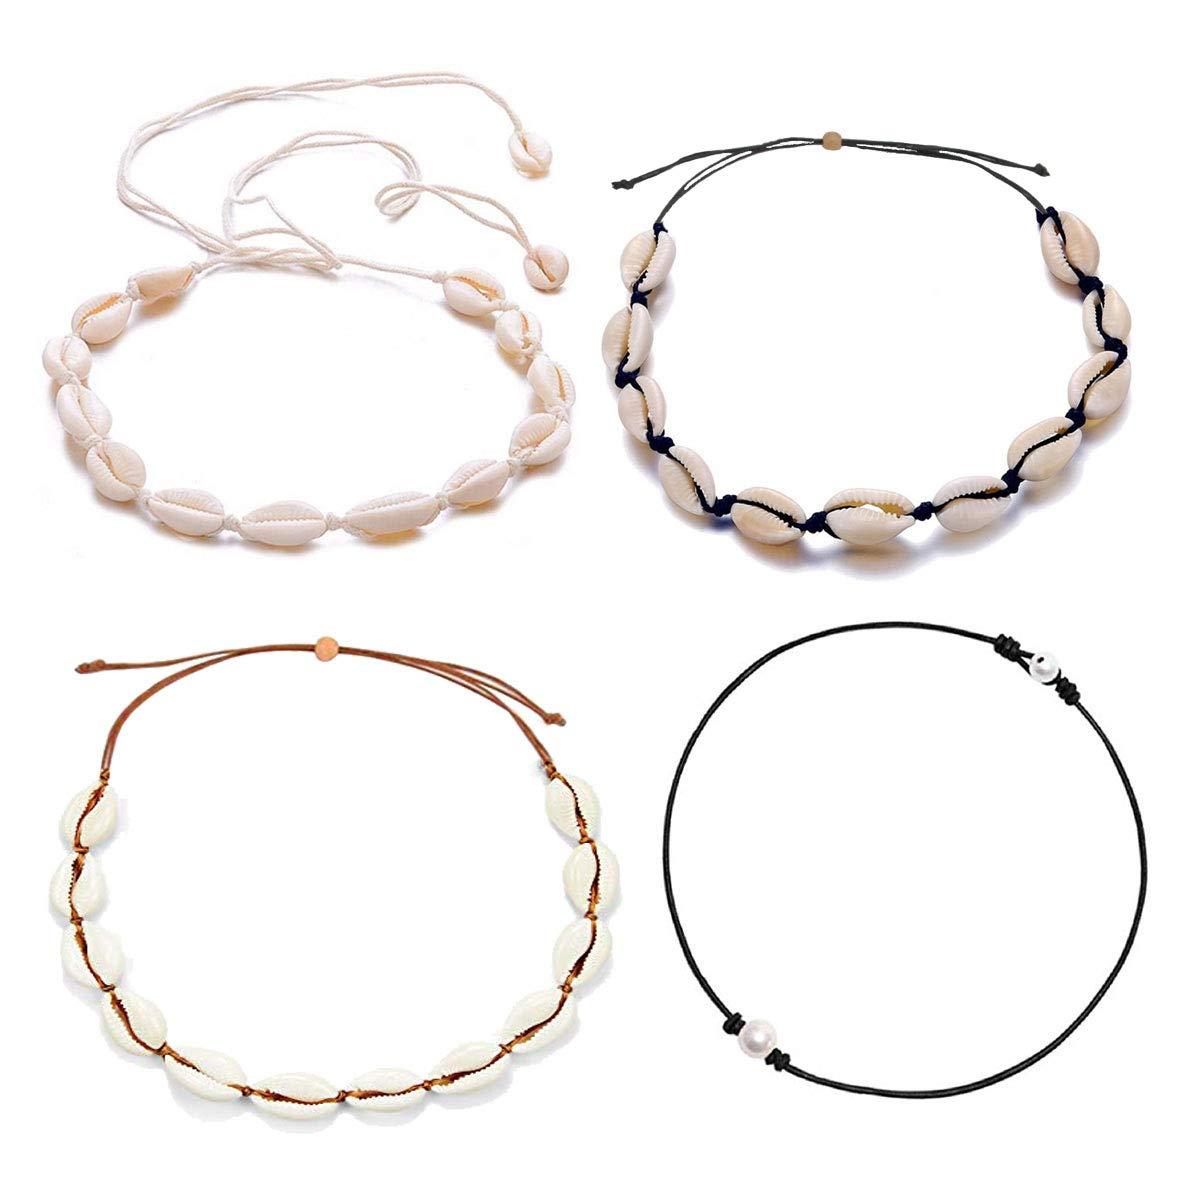 ATIMIGO Summer Beach Shell Conch Choker Handmade Boho Cowrie Pearl Necklace Jewelry for Women Girls